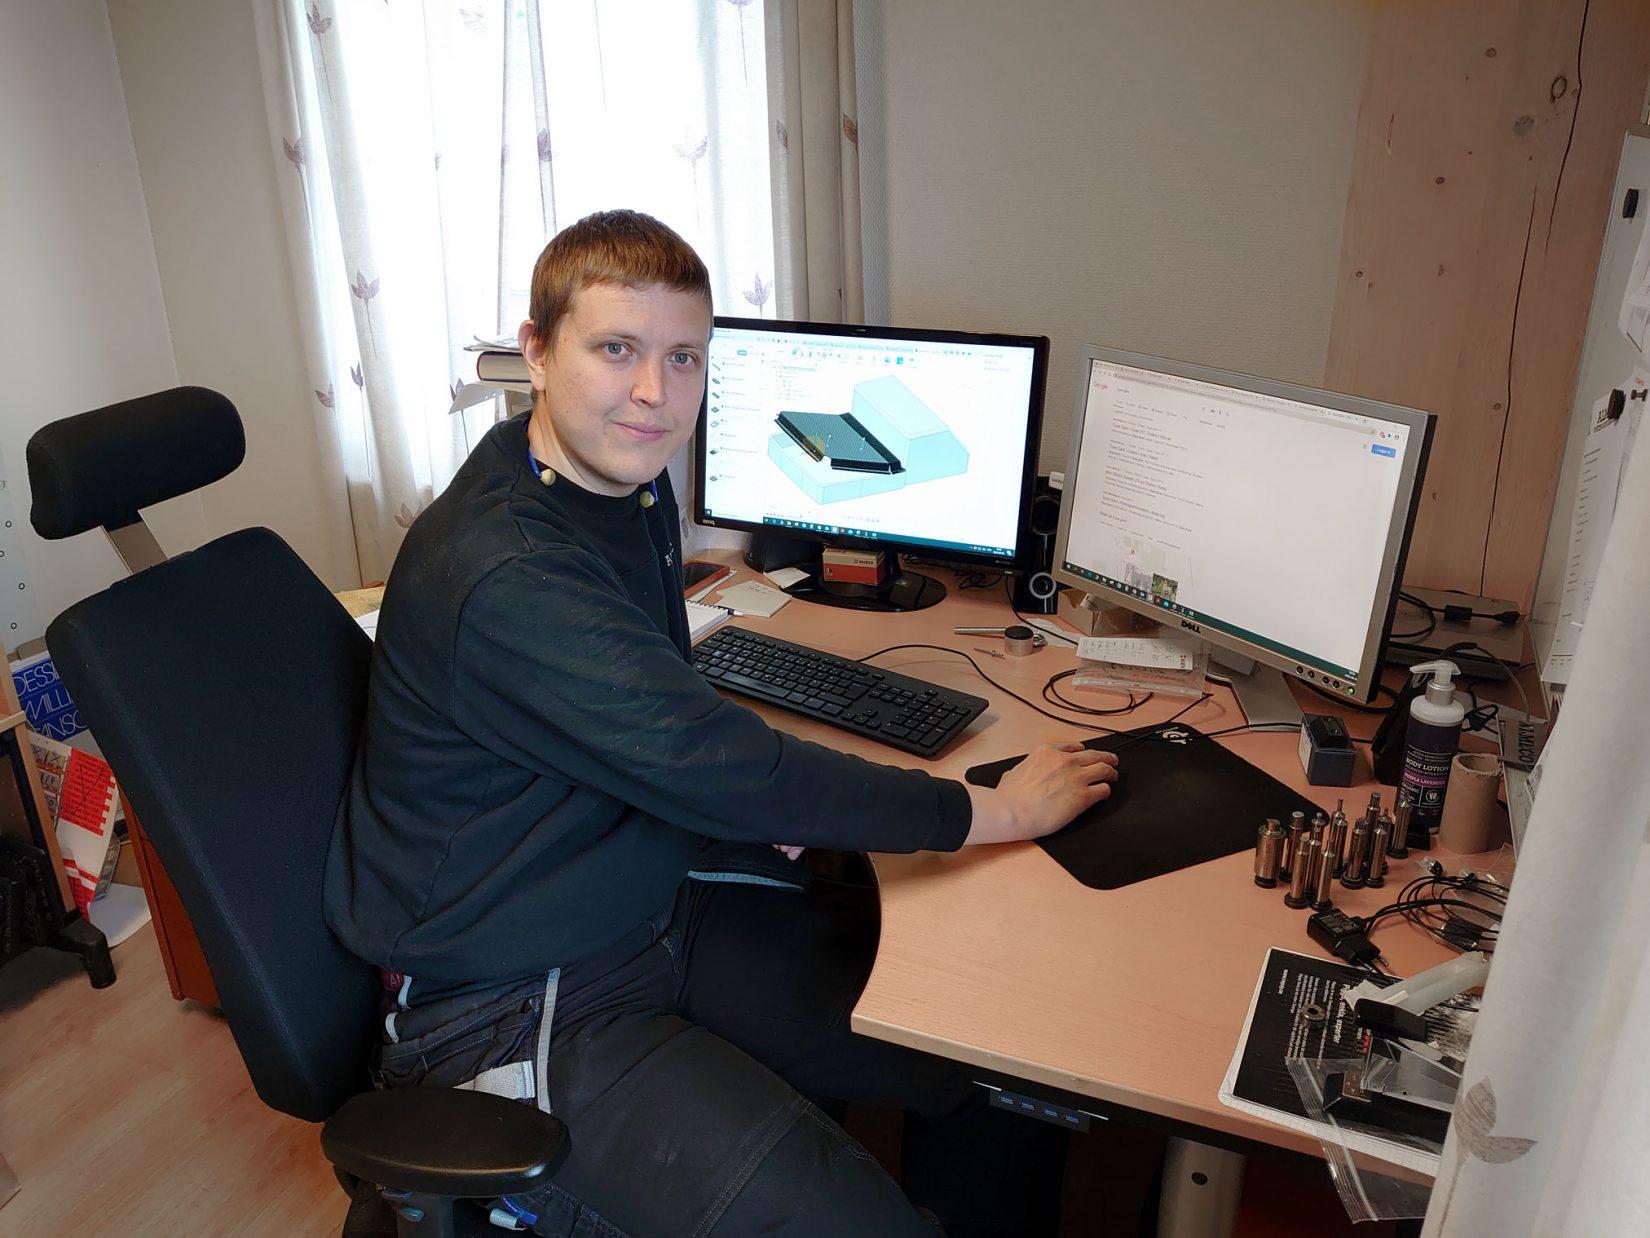 Micke Bengtsson